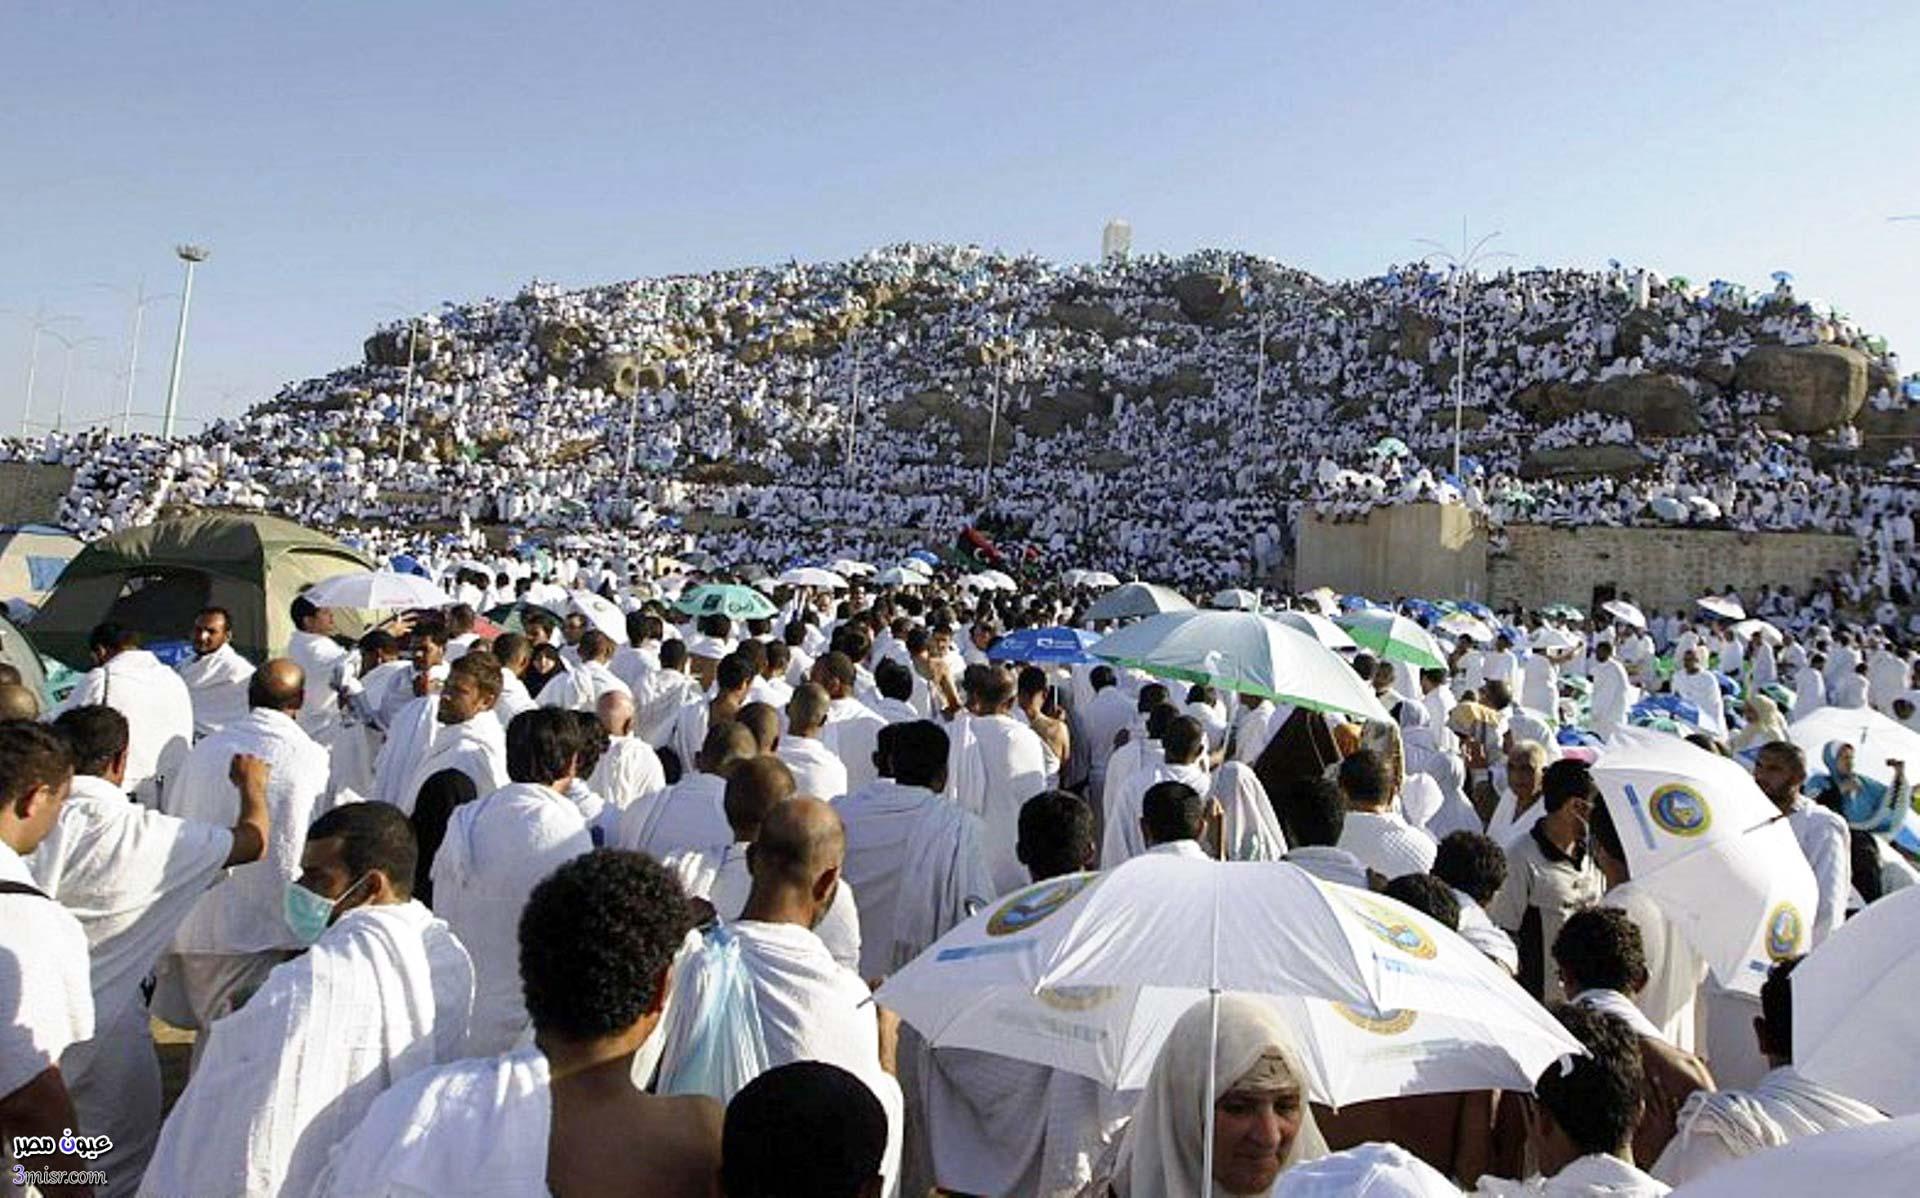 HADJ 2016 : Deux septuagénaires Algériens décédés